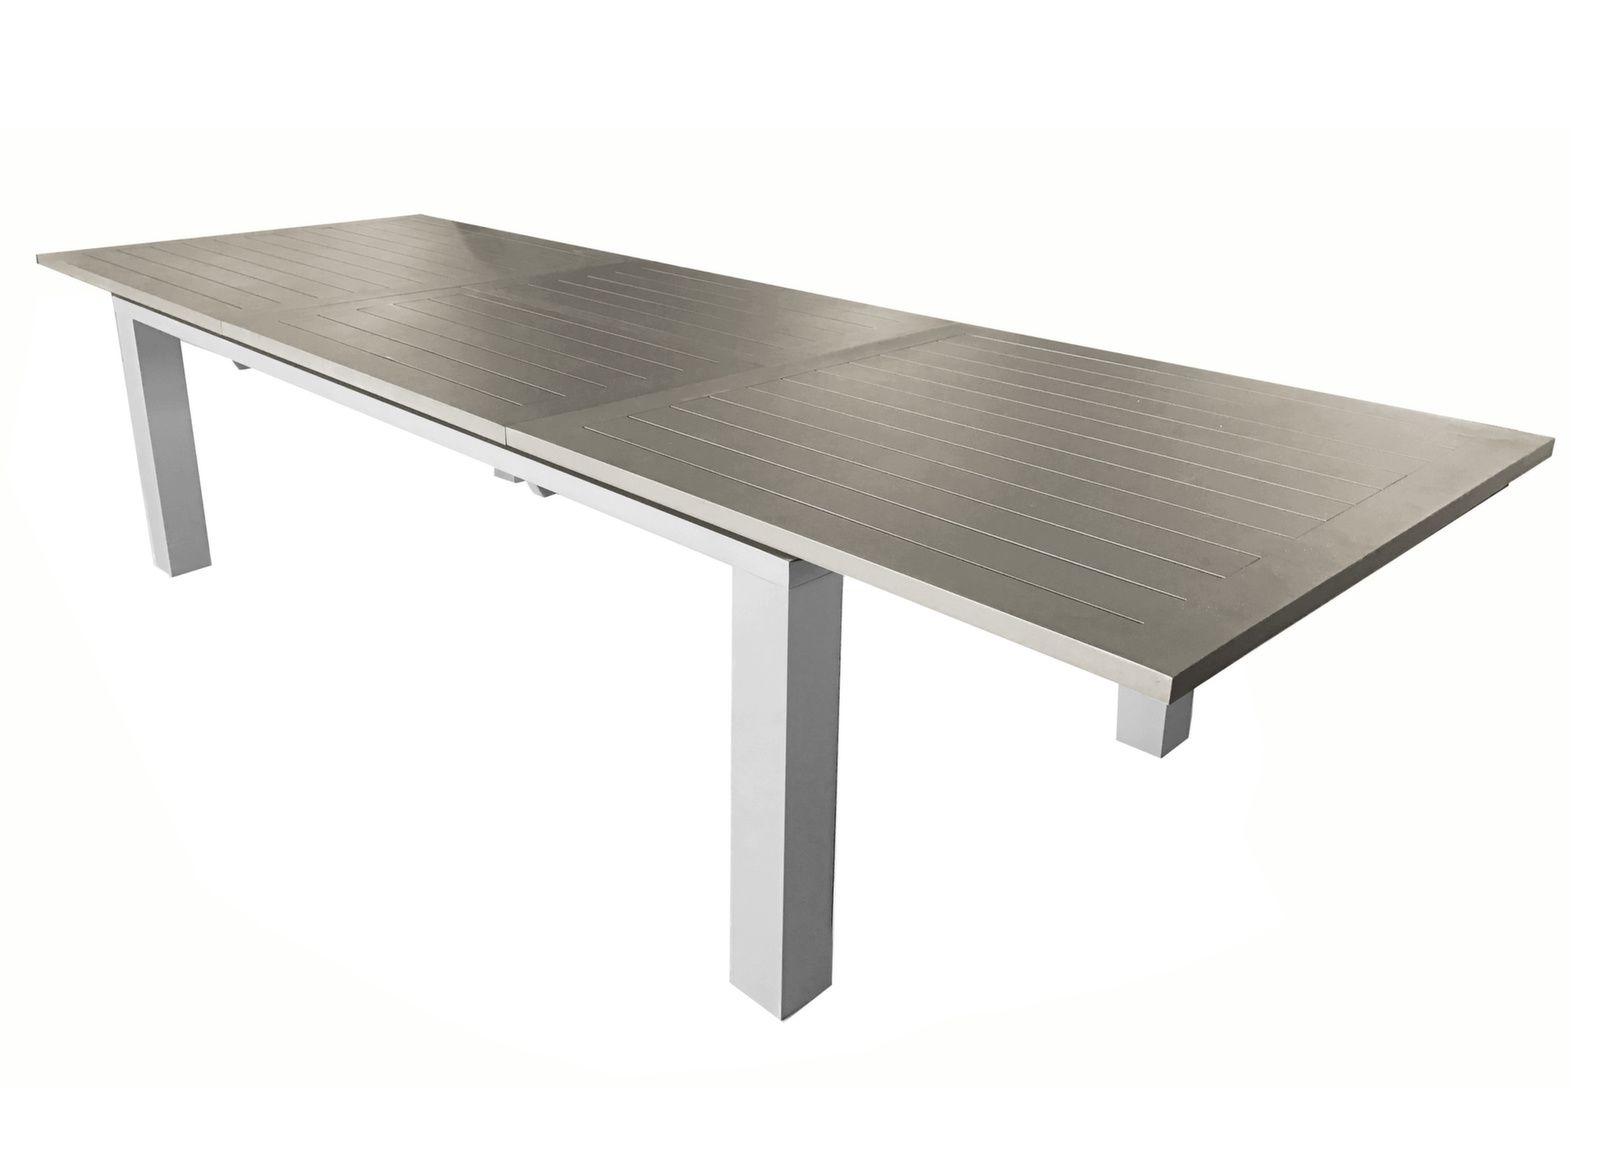 Table Elisa 180/240 cm (Finition Epoxy)